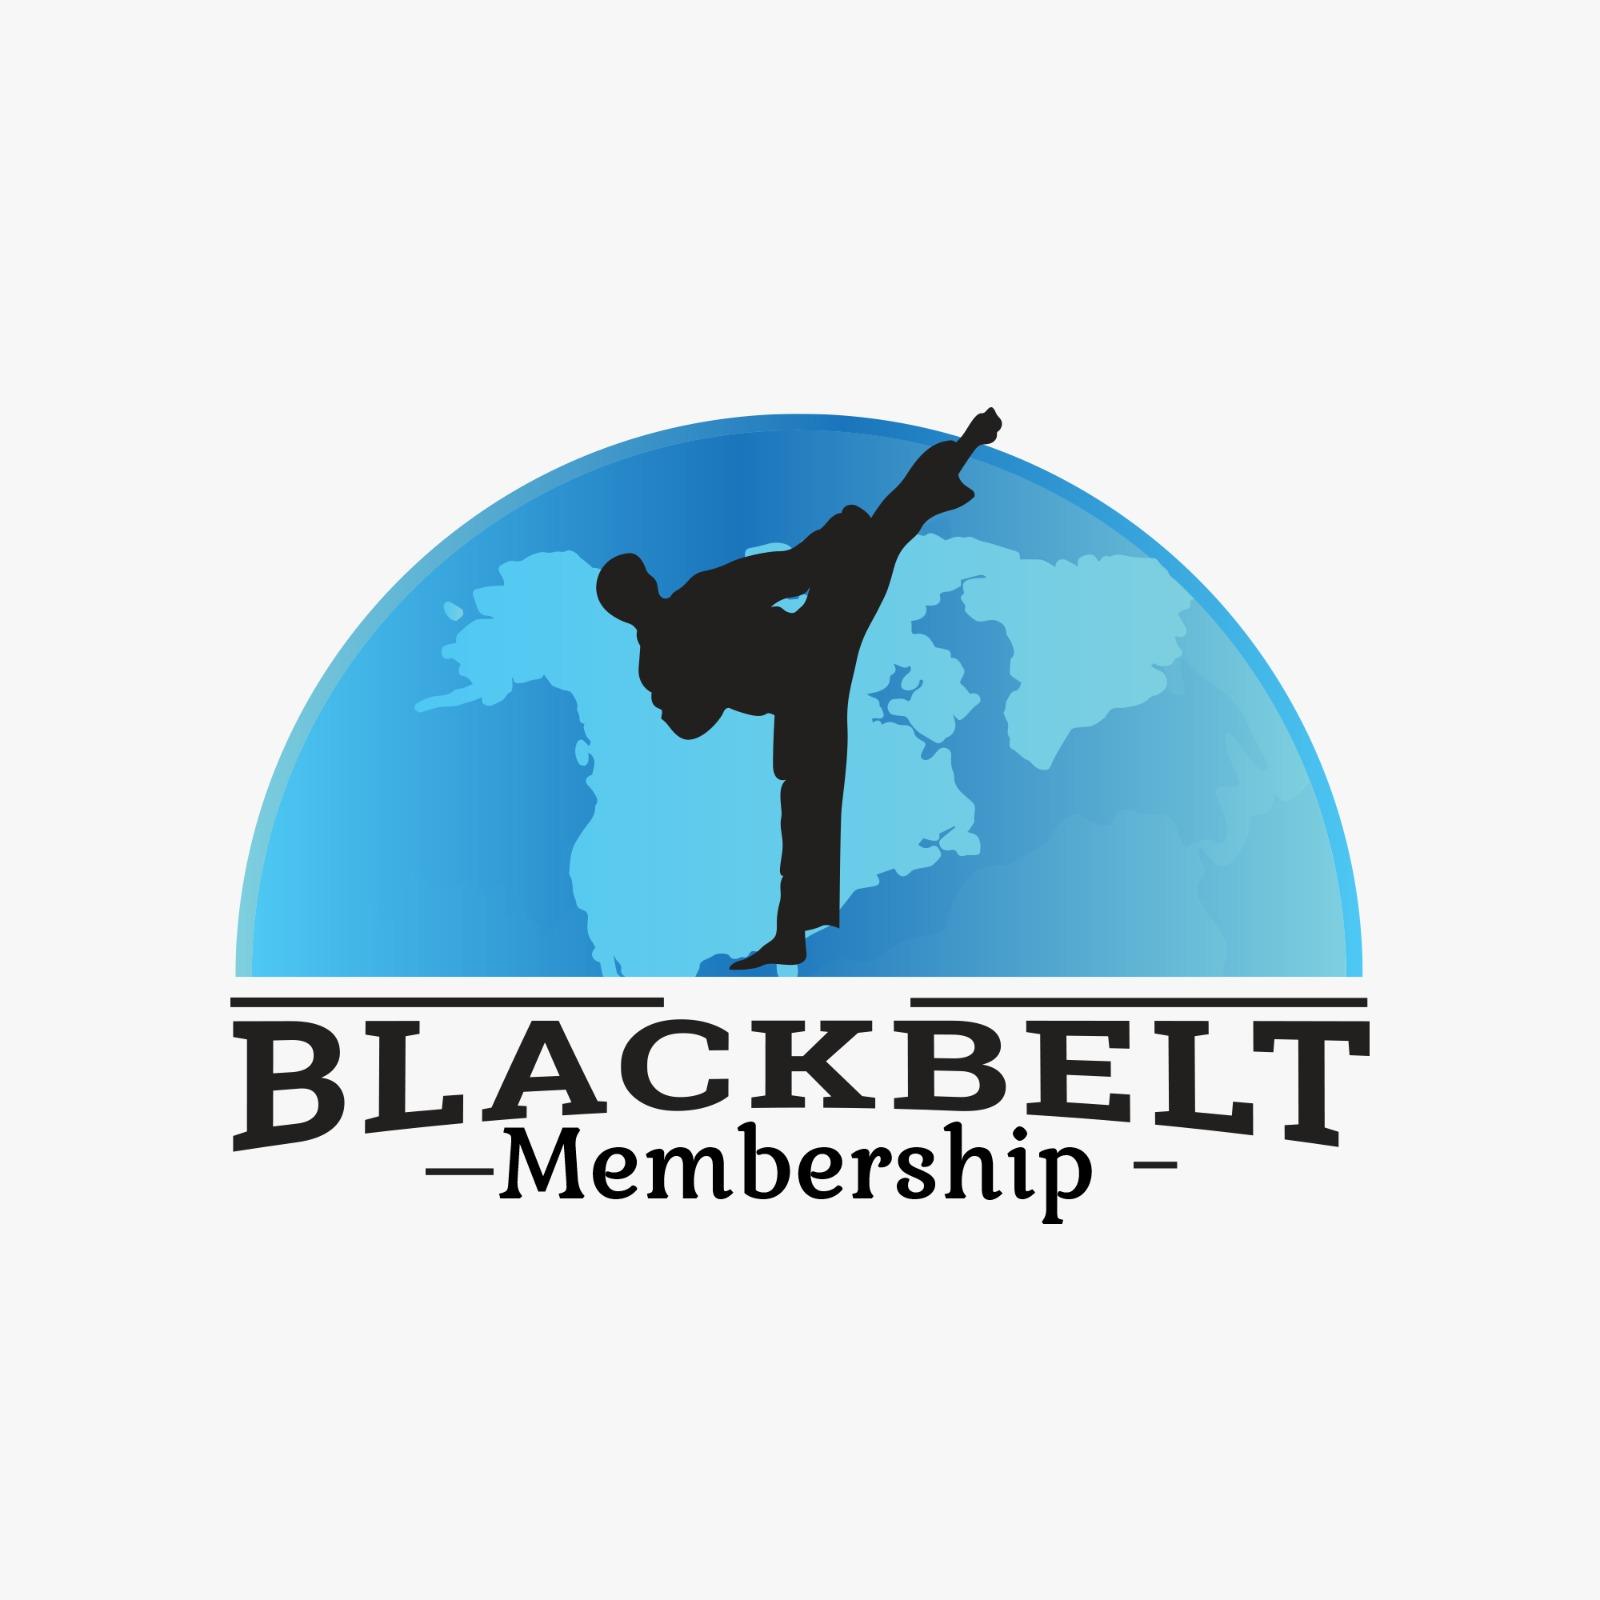 Black Belt Membership Software Helps Launch Martial Arts Schools into the Industry